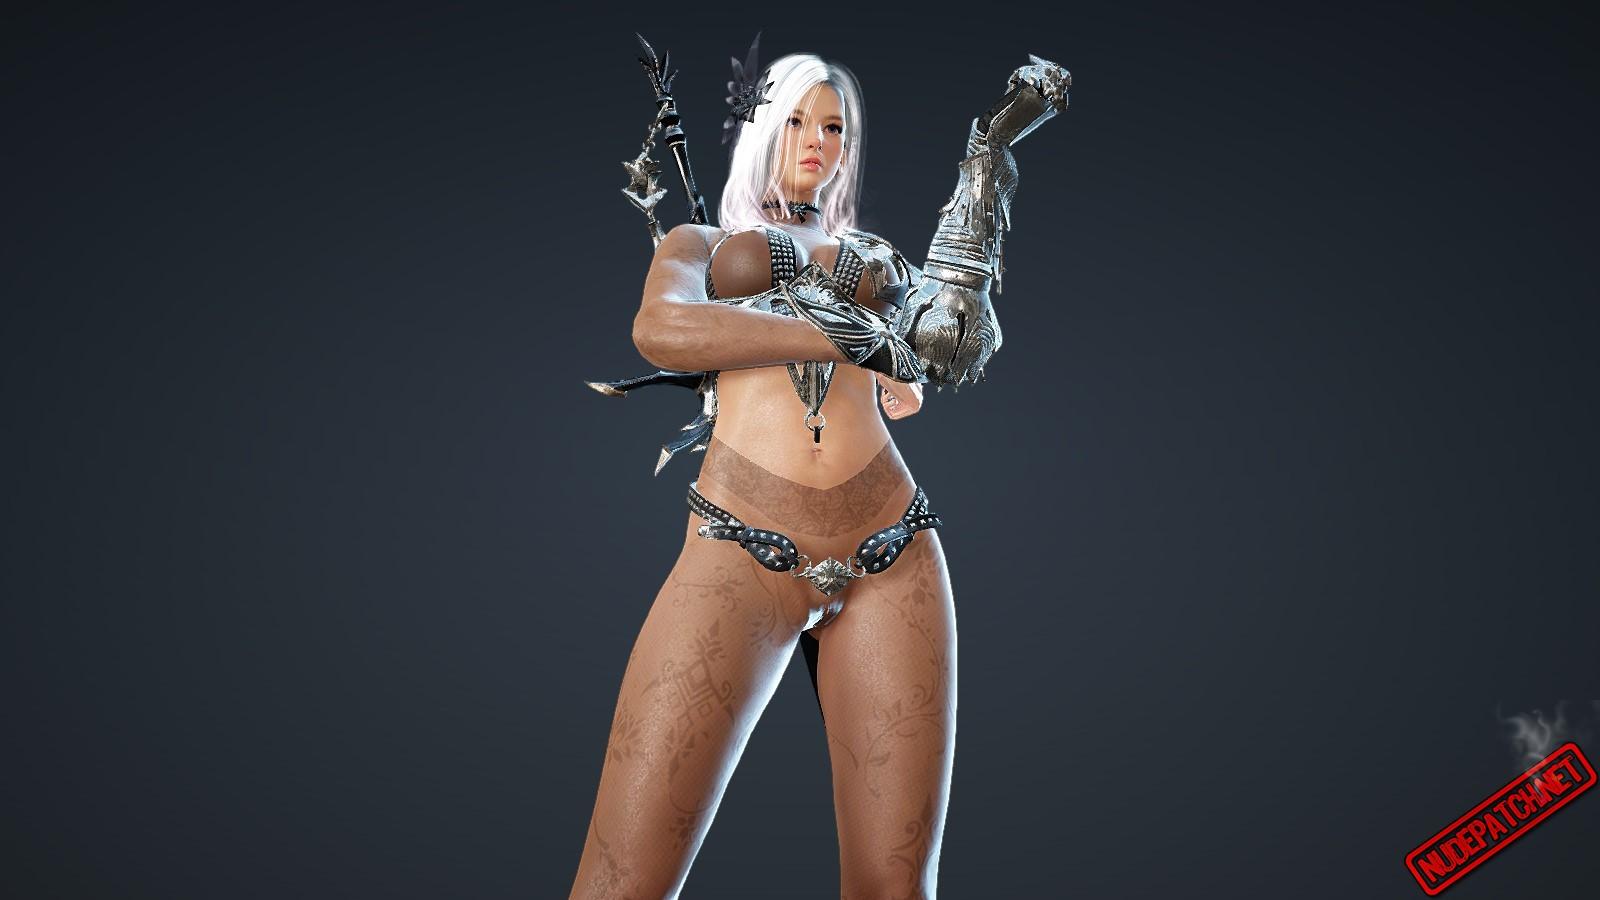 Armor suit nude babe photos 76